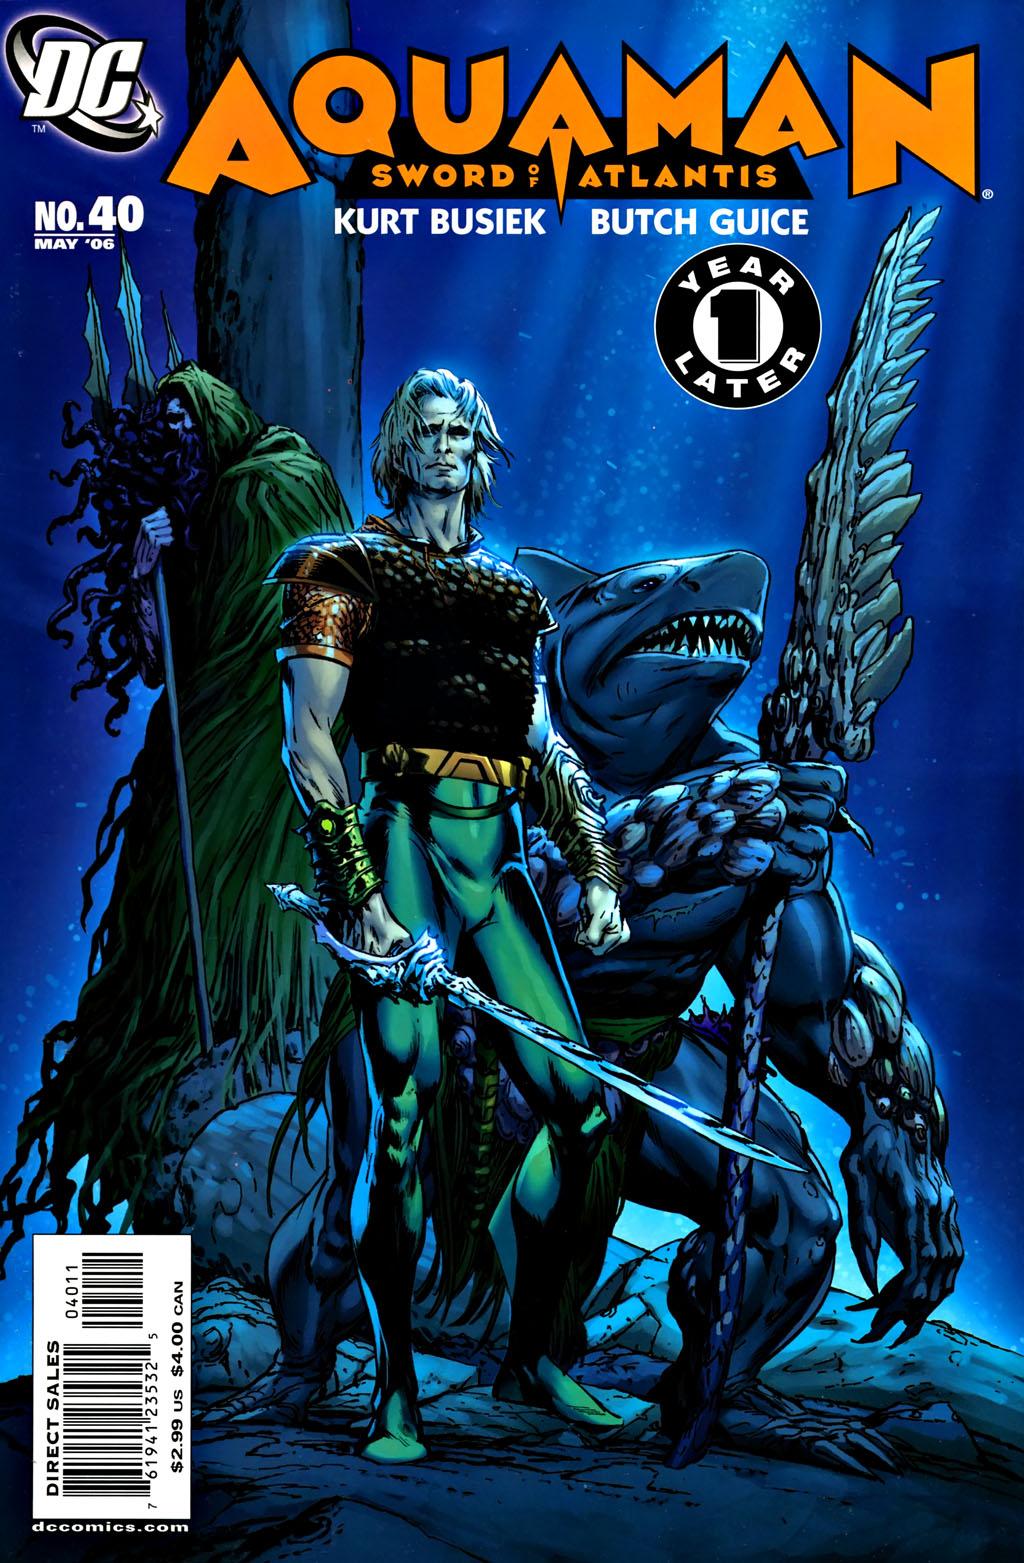 Aquaman: Sword of Atlantis 40 Page 1